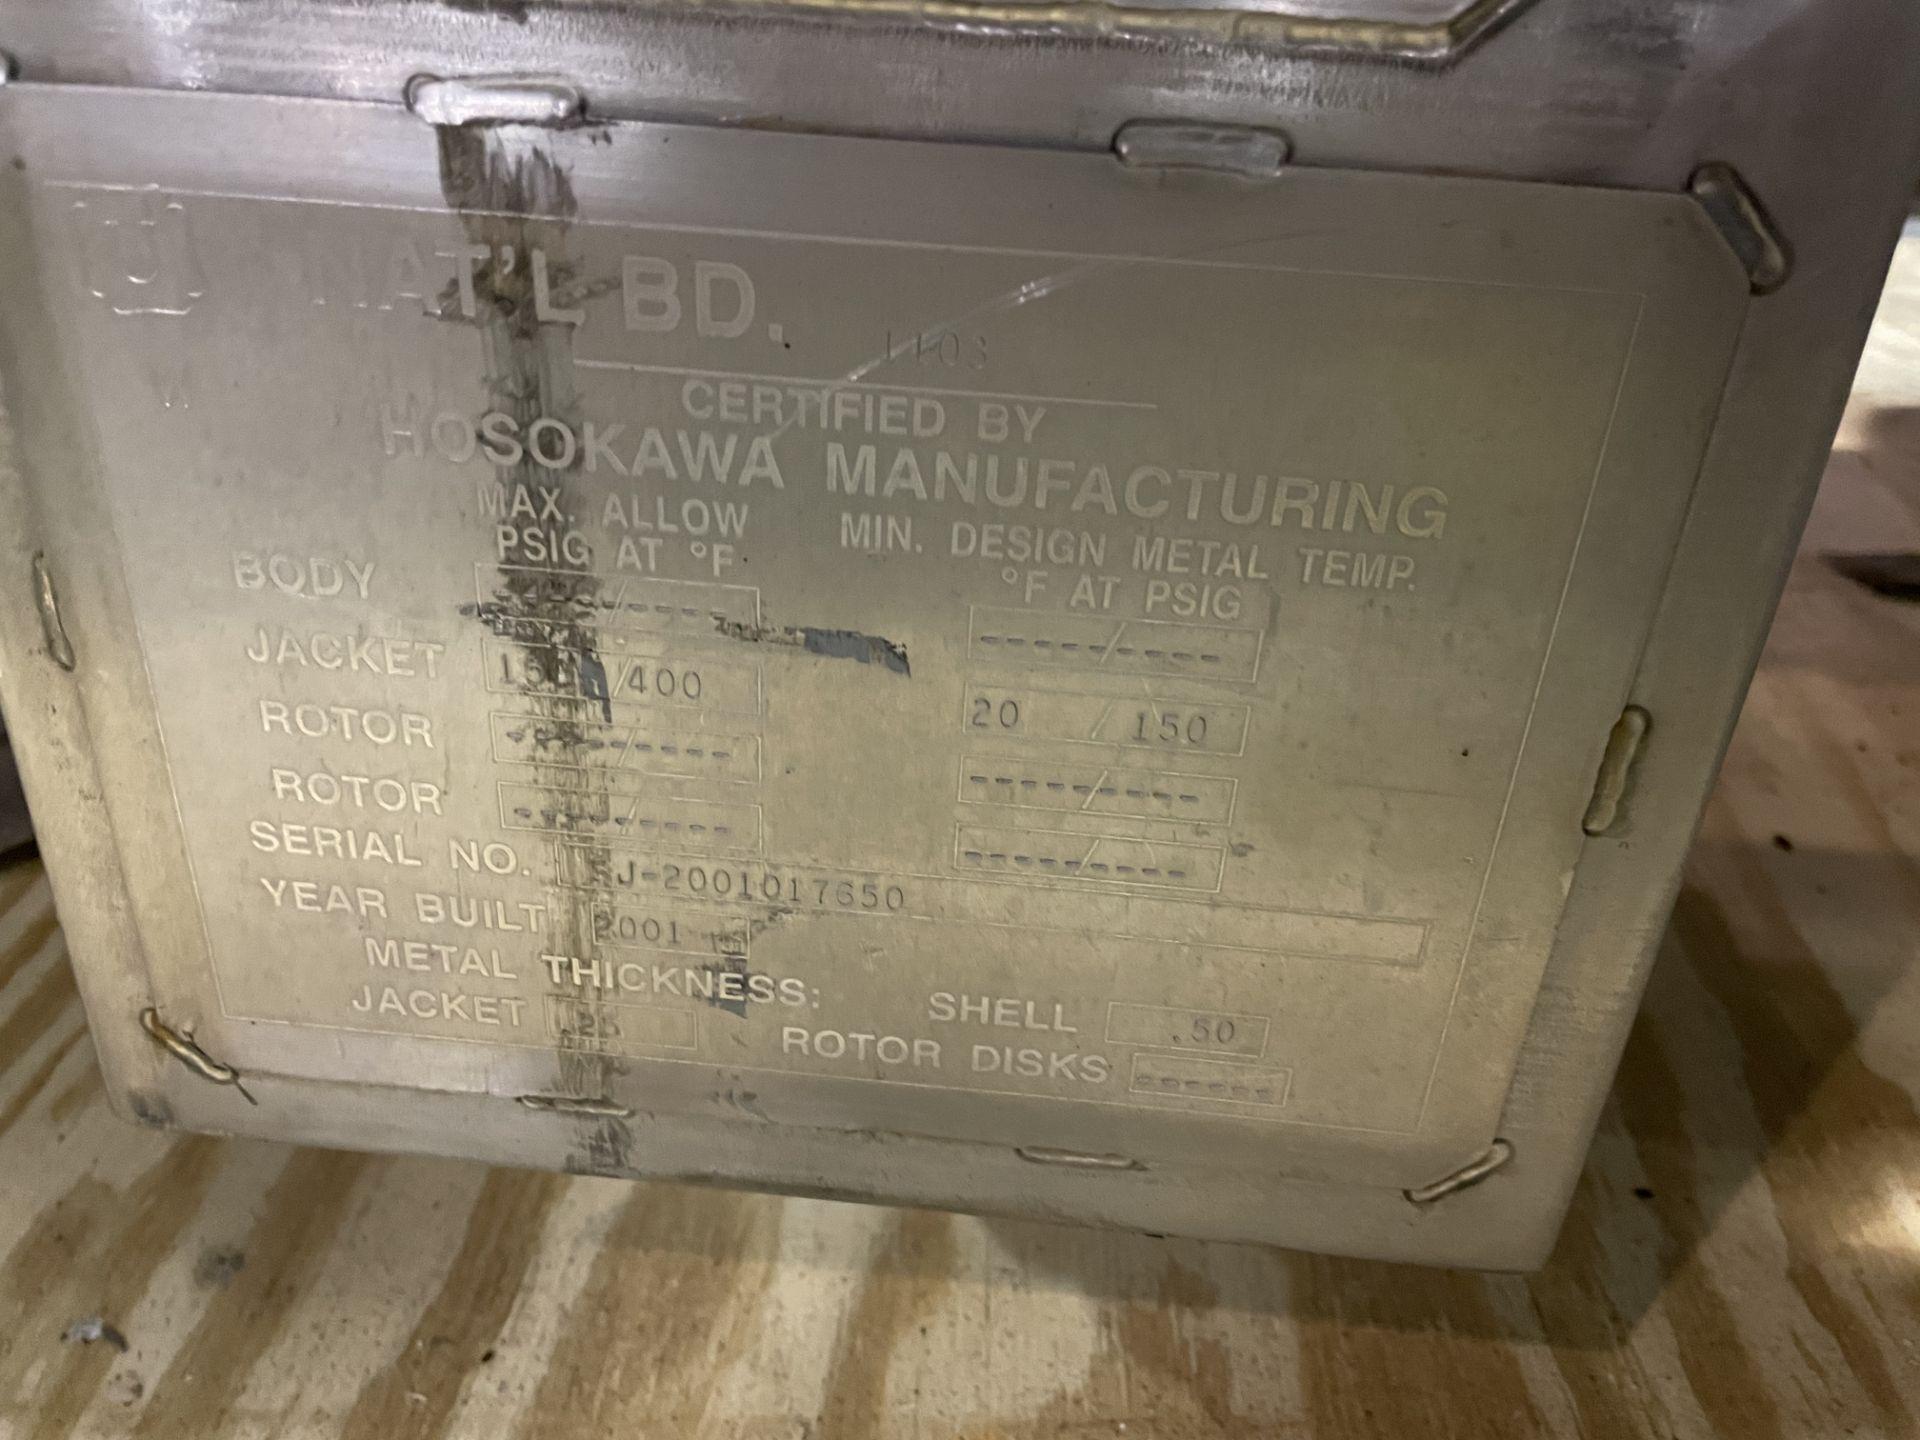 Bepex - Hosokawa Solidaire Thin Film Paddle Dryer Model SJS 24-14 S/N SJ-2001017650 With Mokon Model - Image 6 of 12